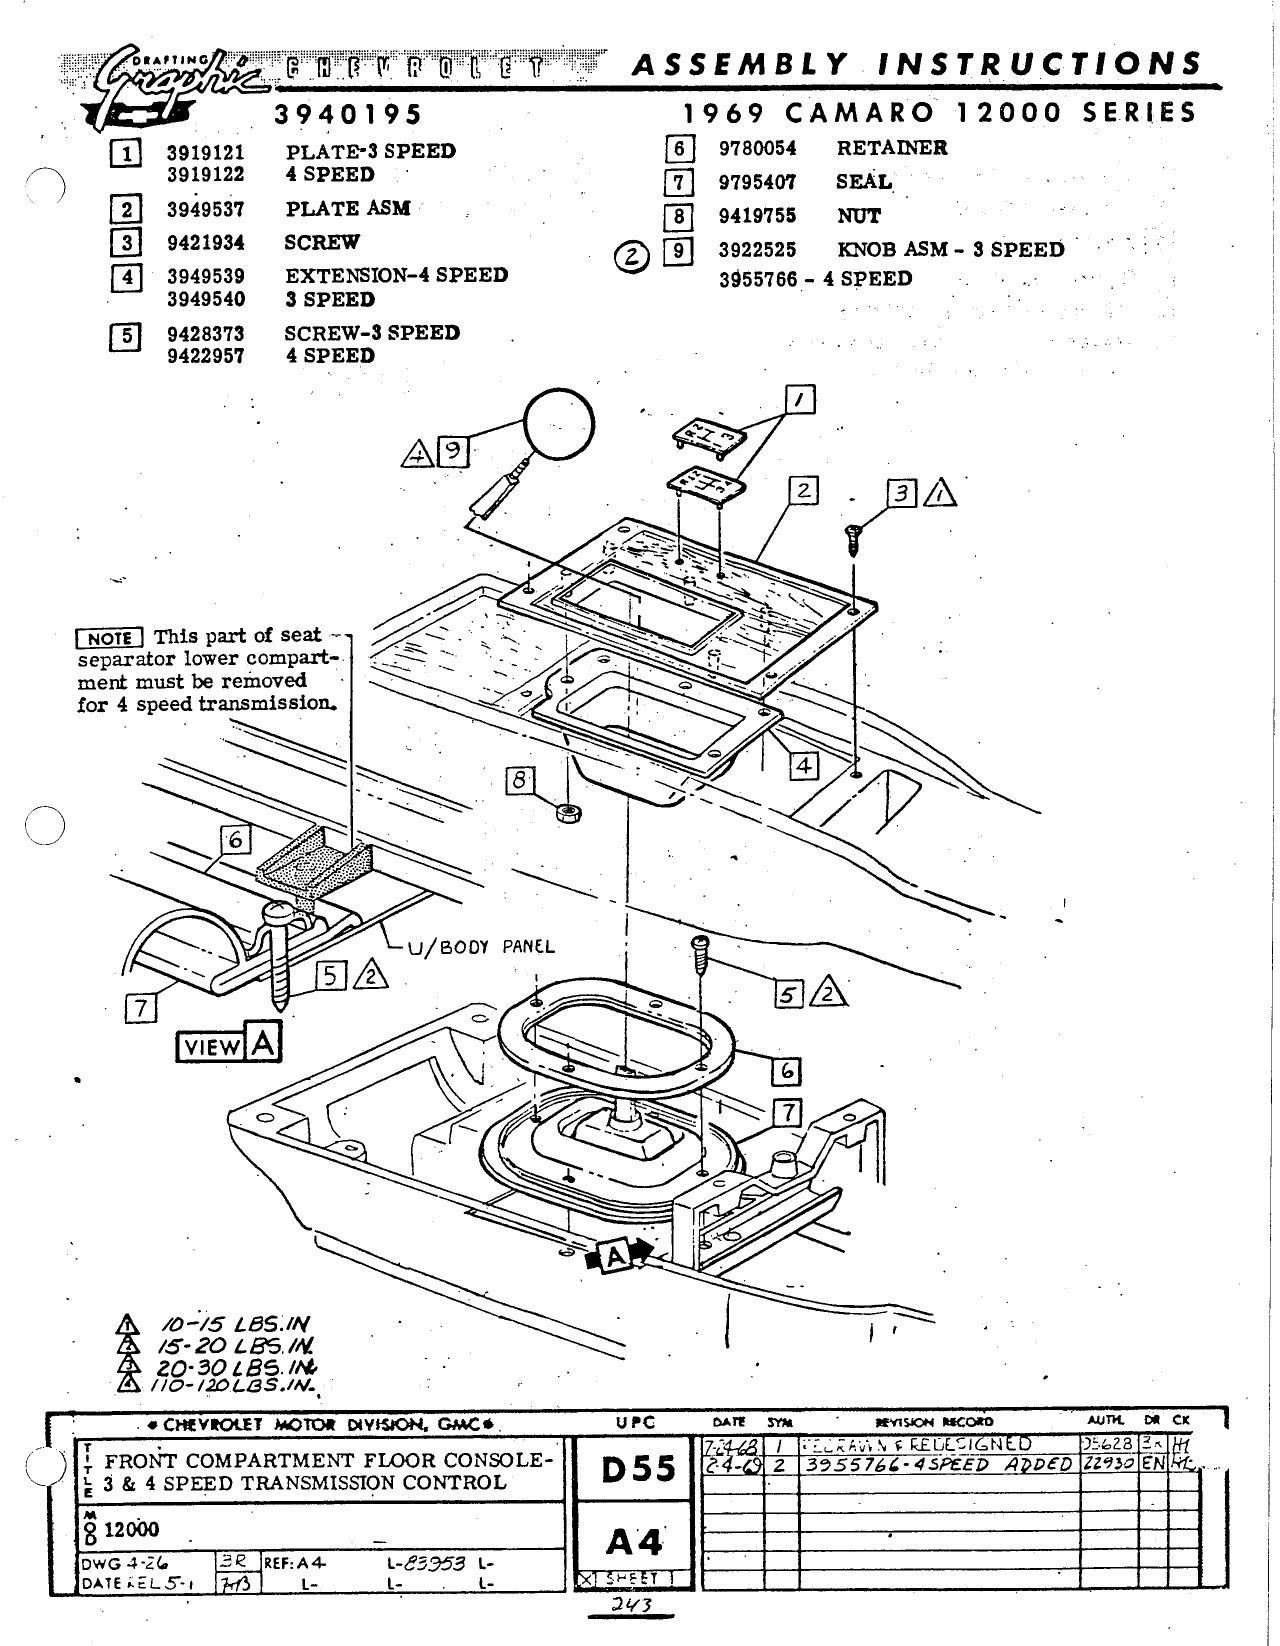 ... Camaro Assembly Manual April 1968 ...